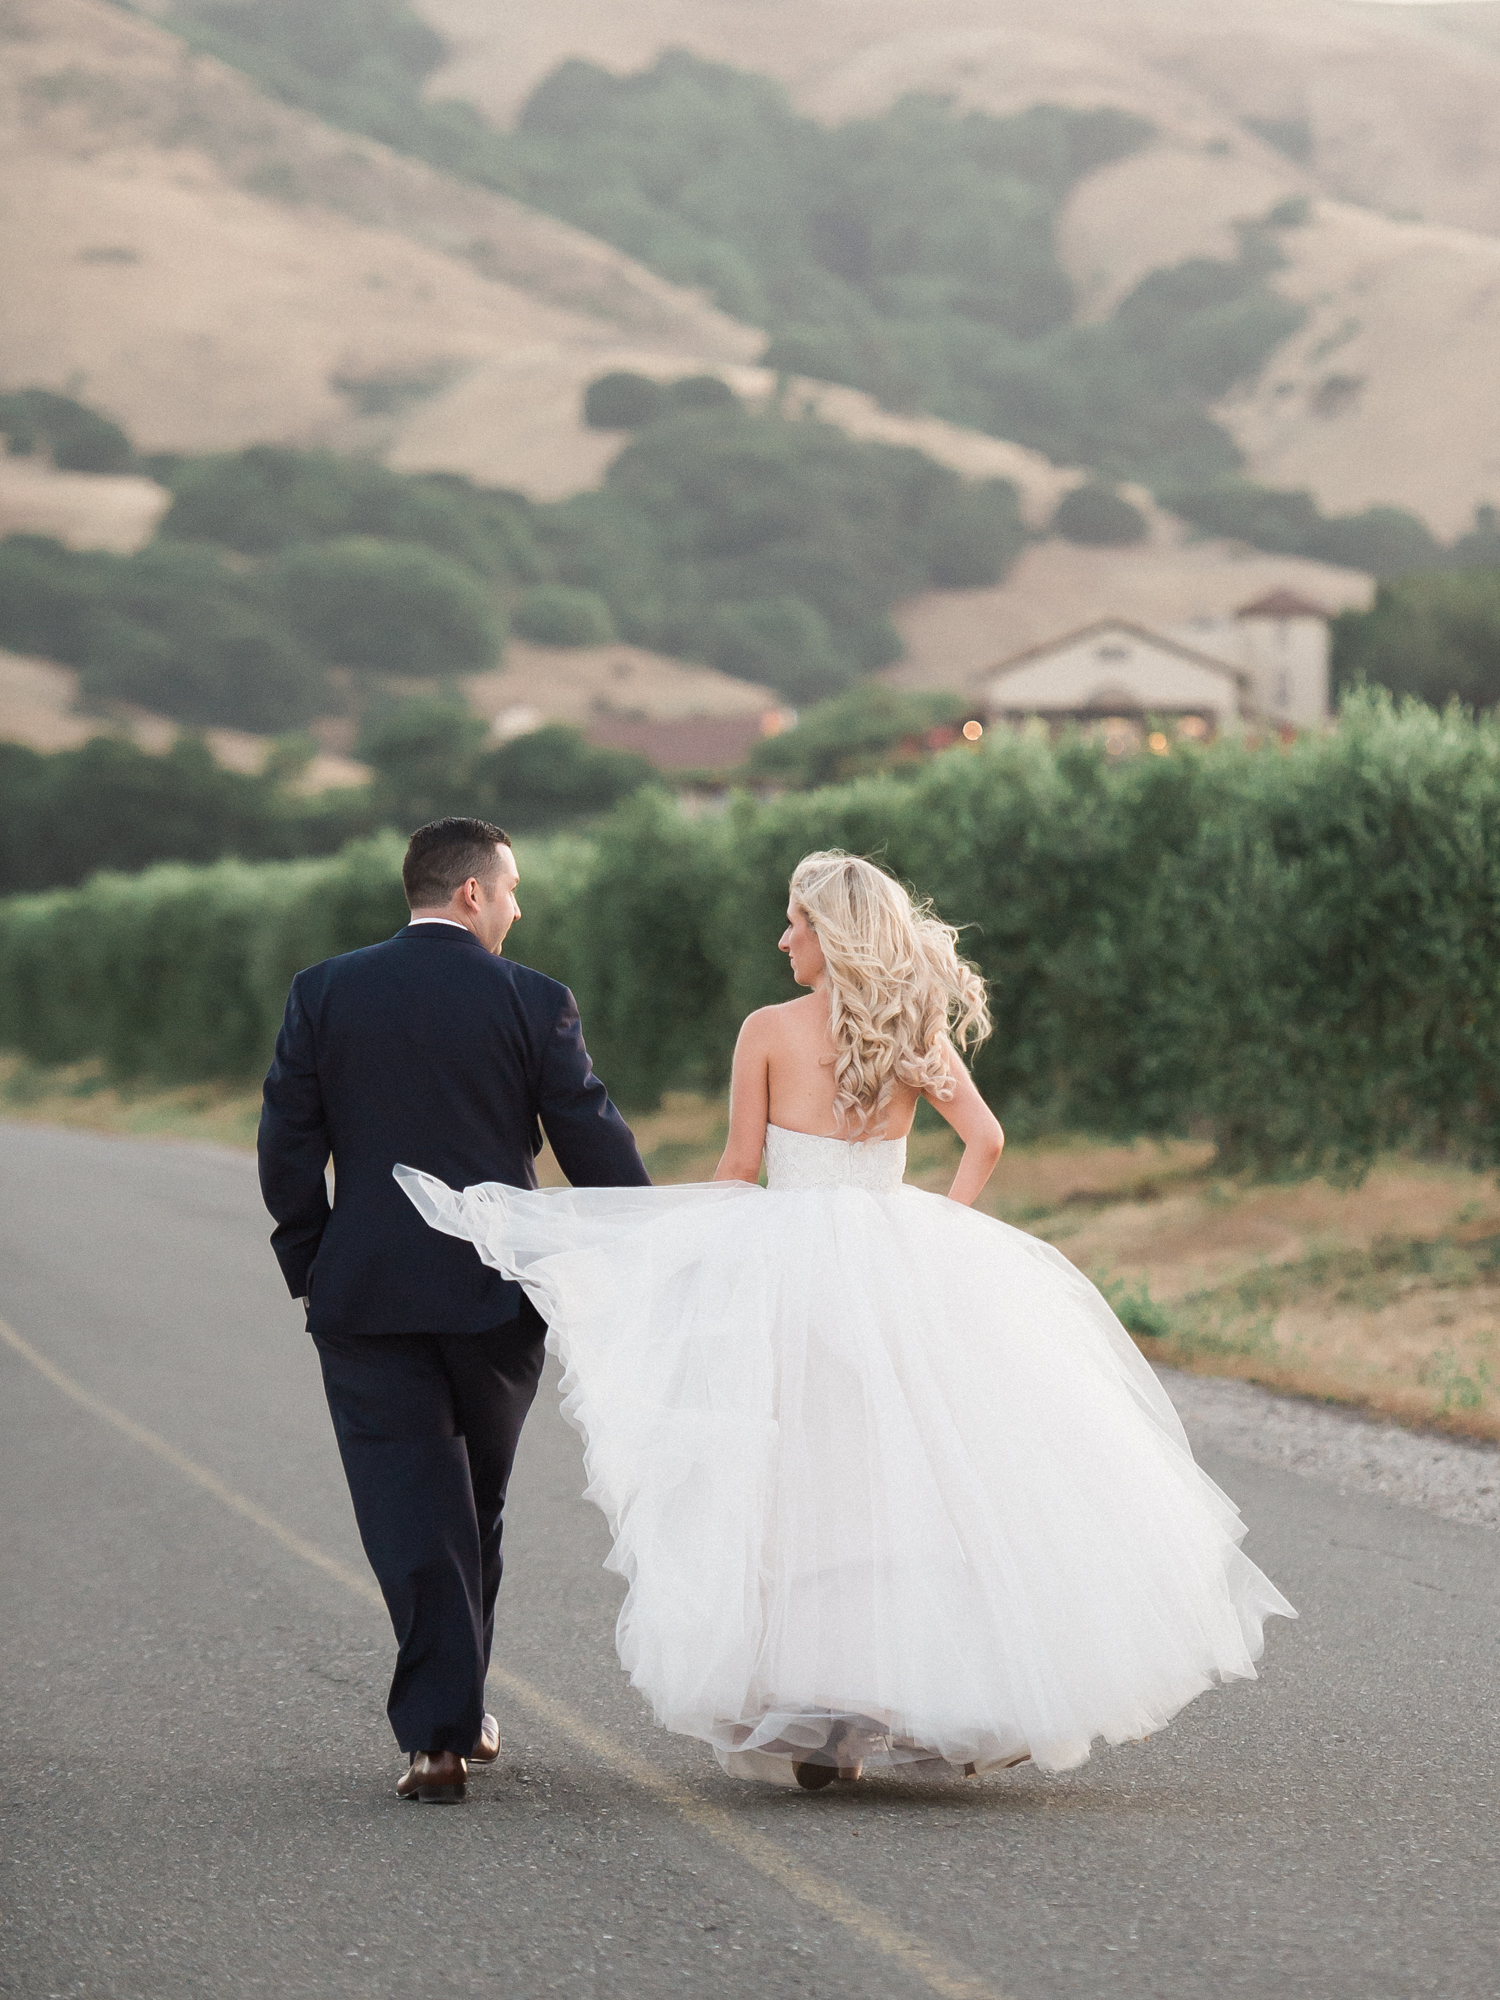 Aimee+Logan_wedding_spp-127.jpg